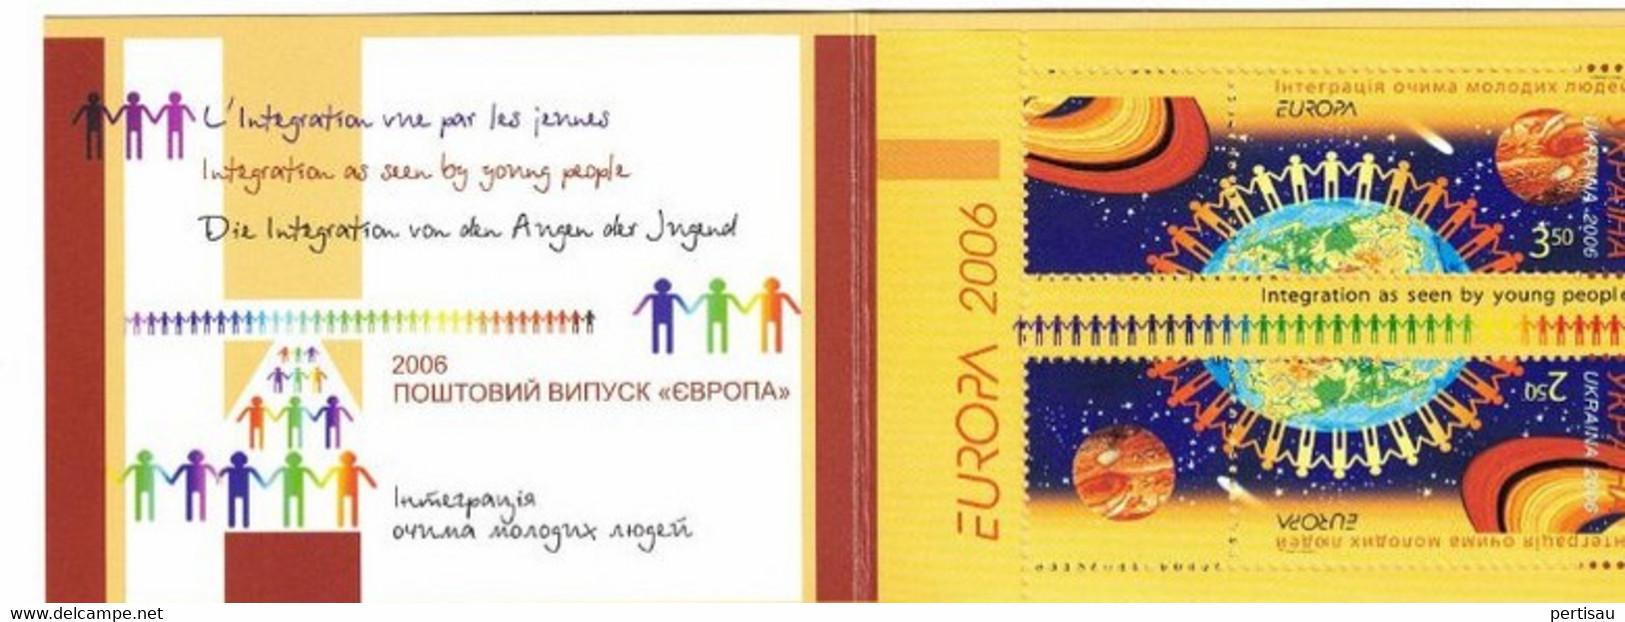 Ukraine H Blad 2006 - 2006